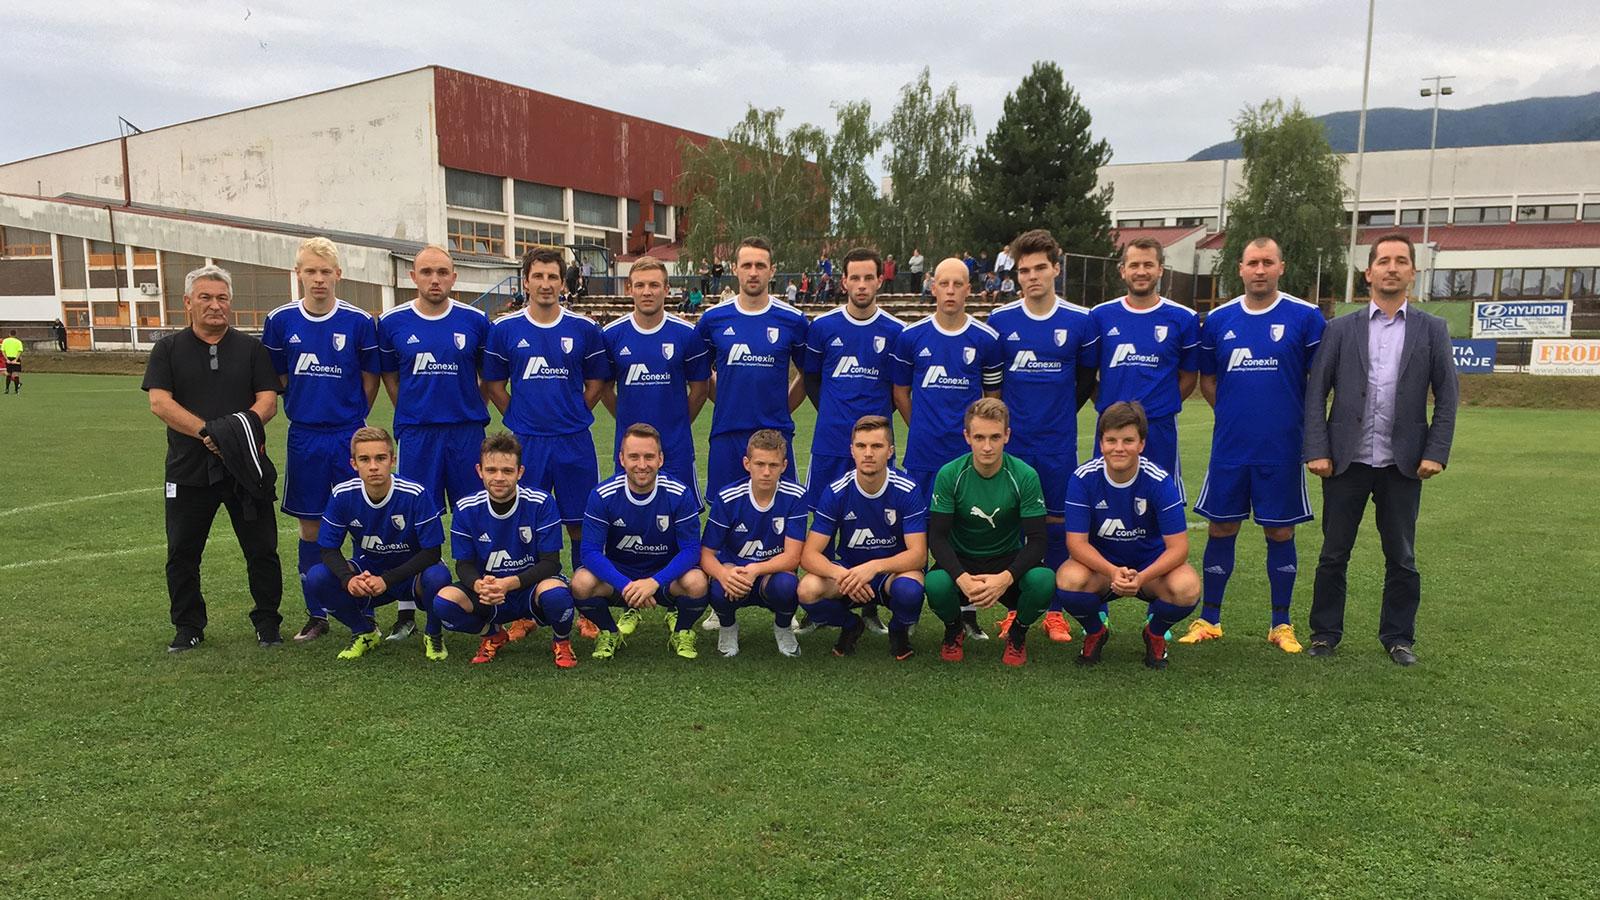 Seniori NK Ivančica Ivanec - sezona 18-19